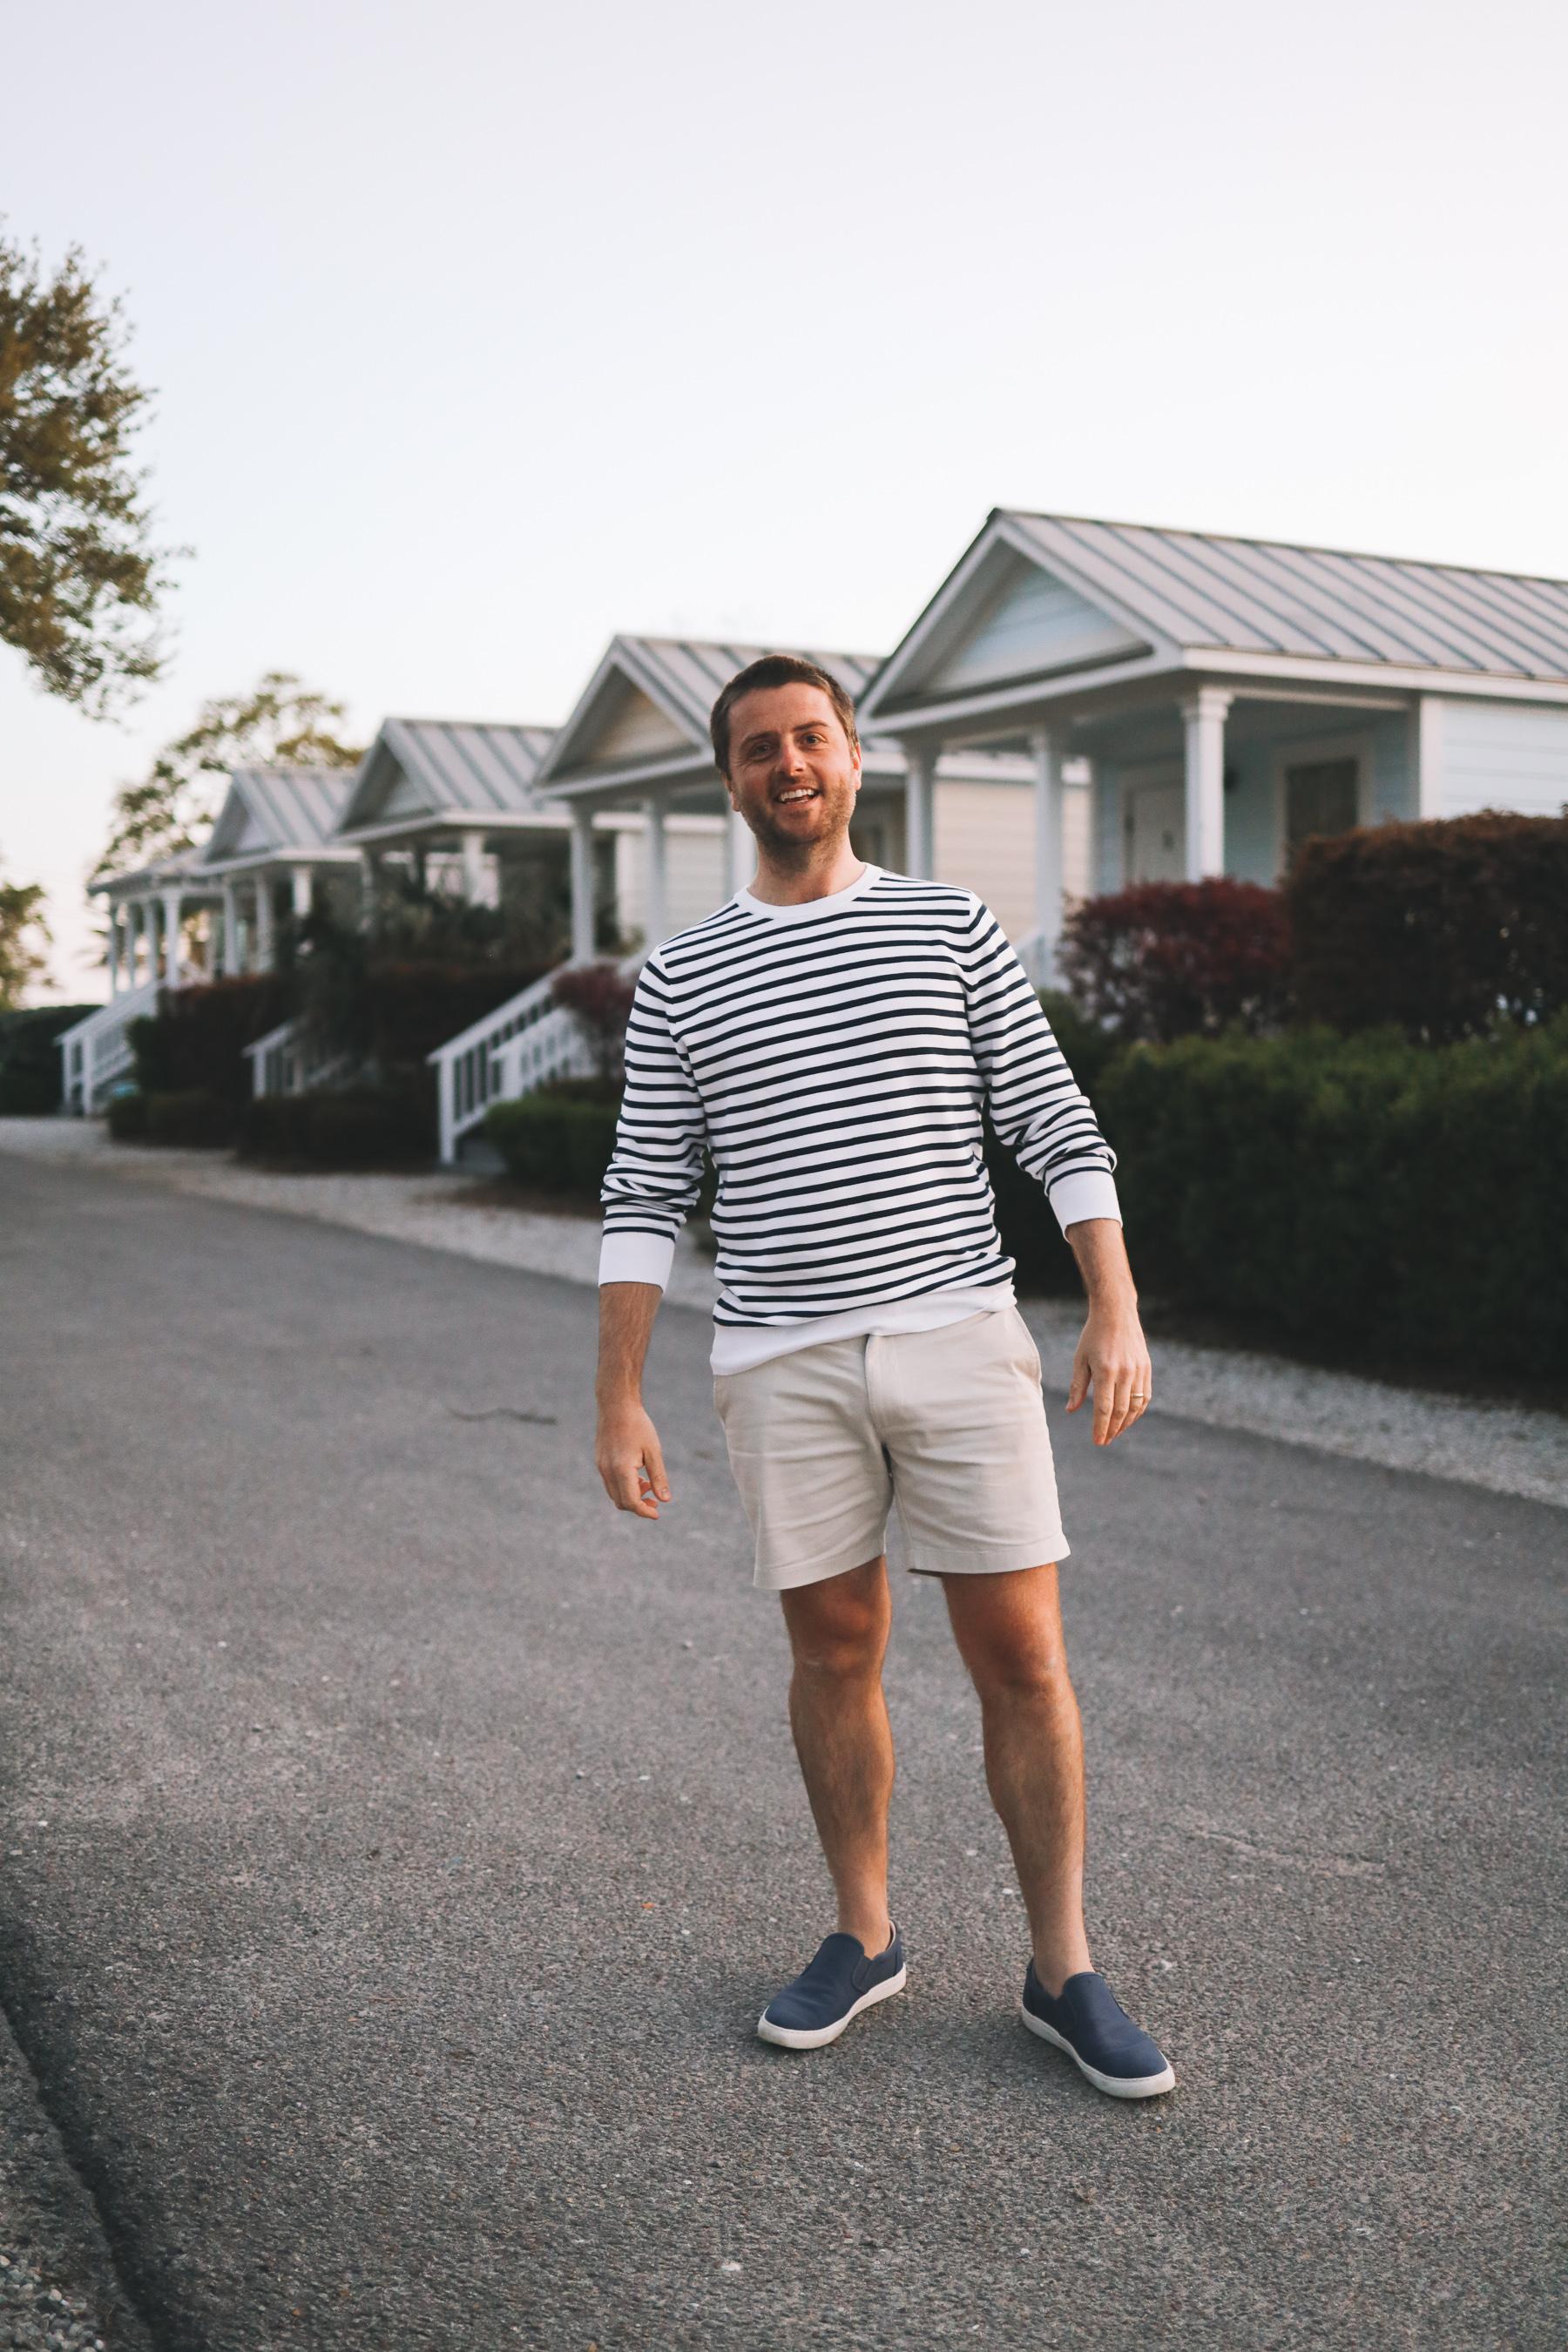 mitch in striped shirt